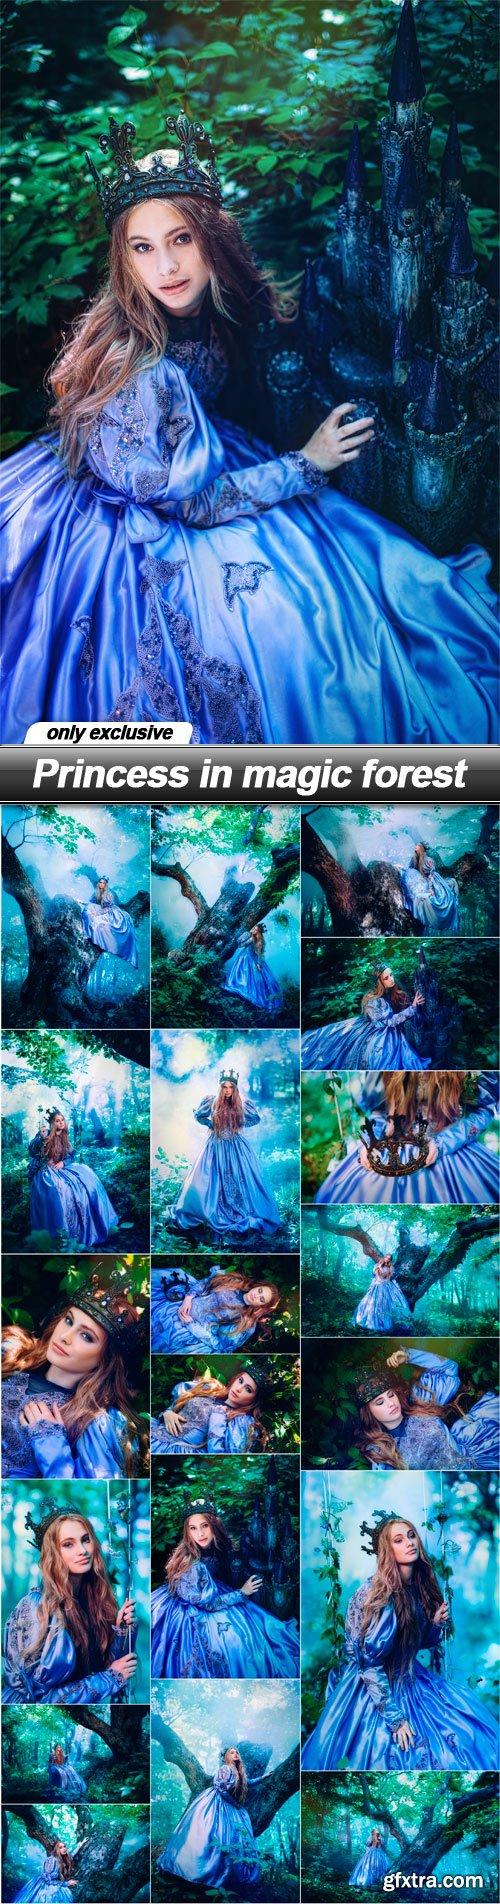 Princess in magic forest - 19 UHQ JPEG